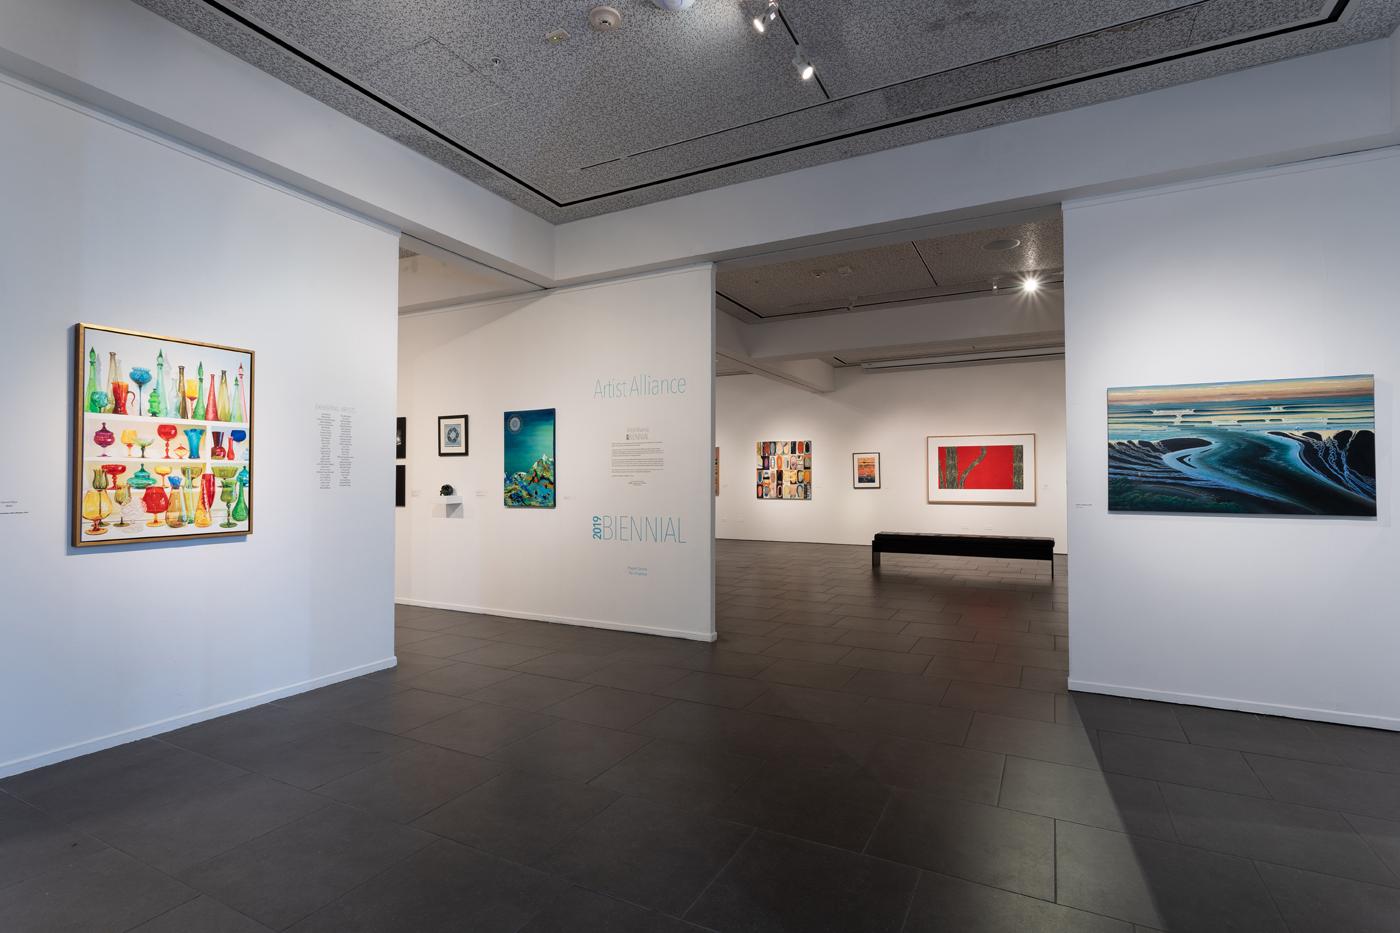 Artist Alliance 2019 Biennial exhibition entrance